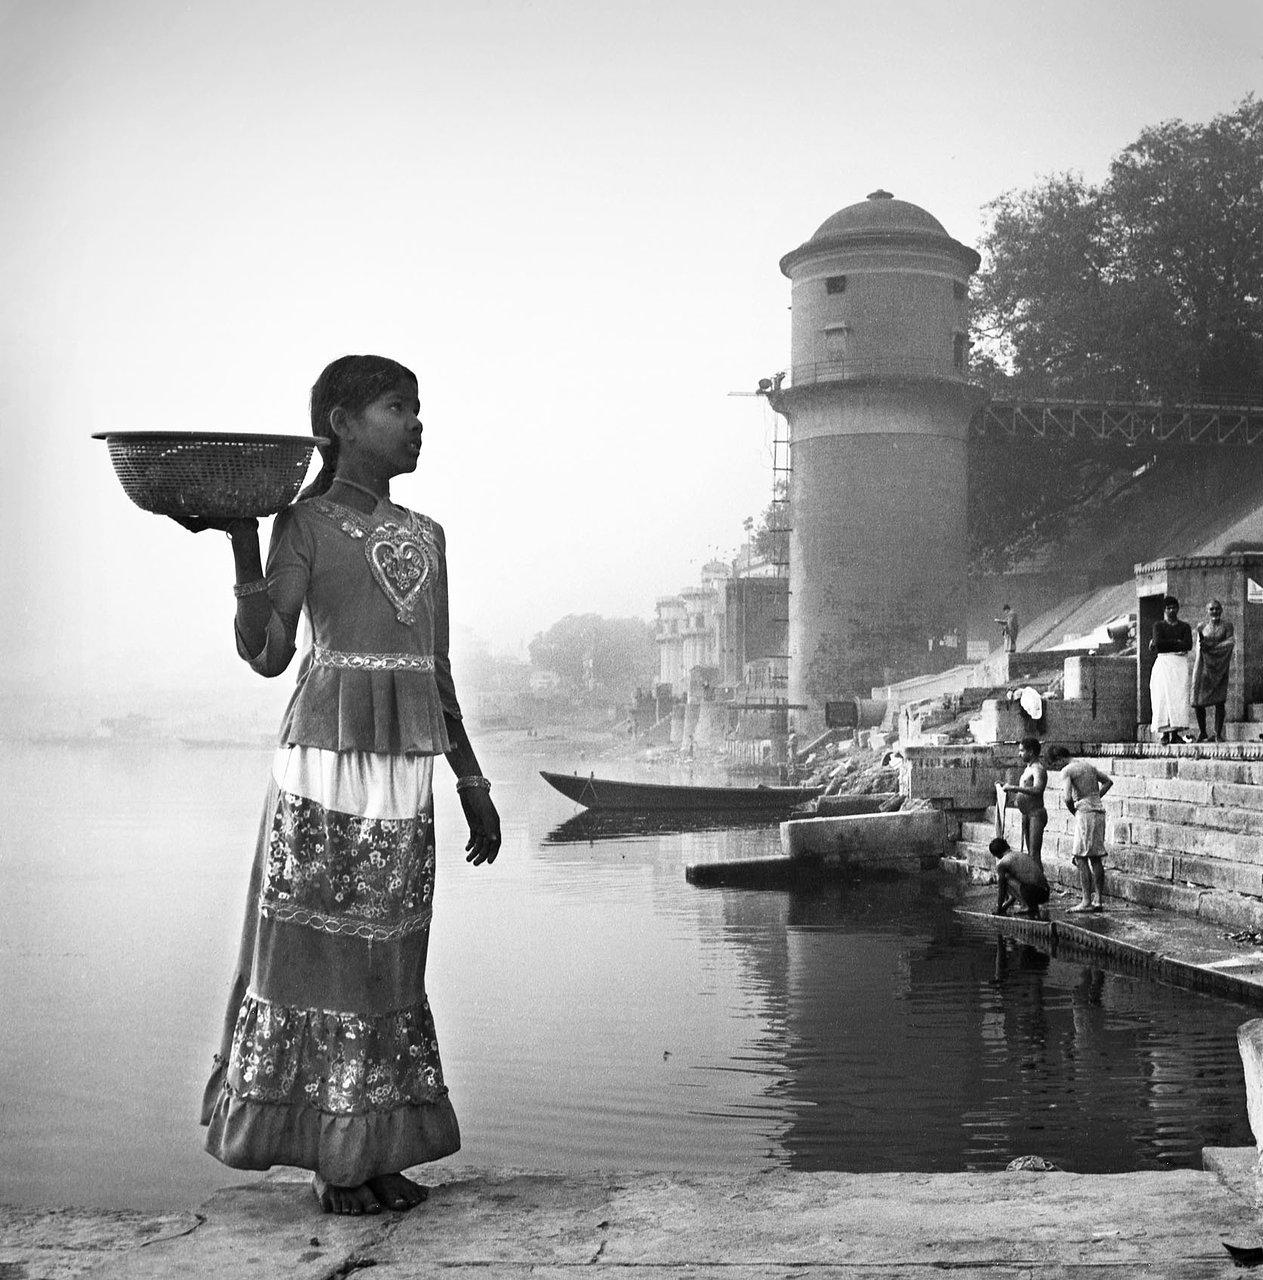 Puja girl 1, Varanassi